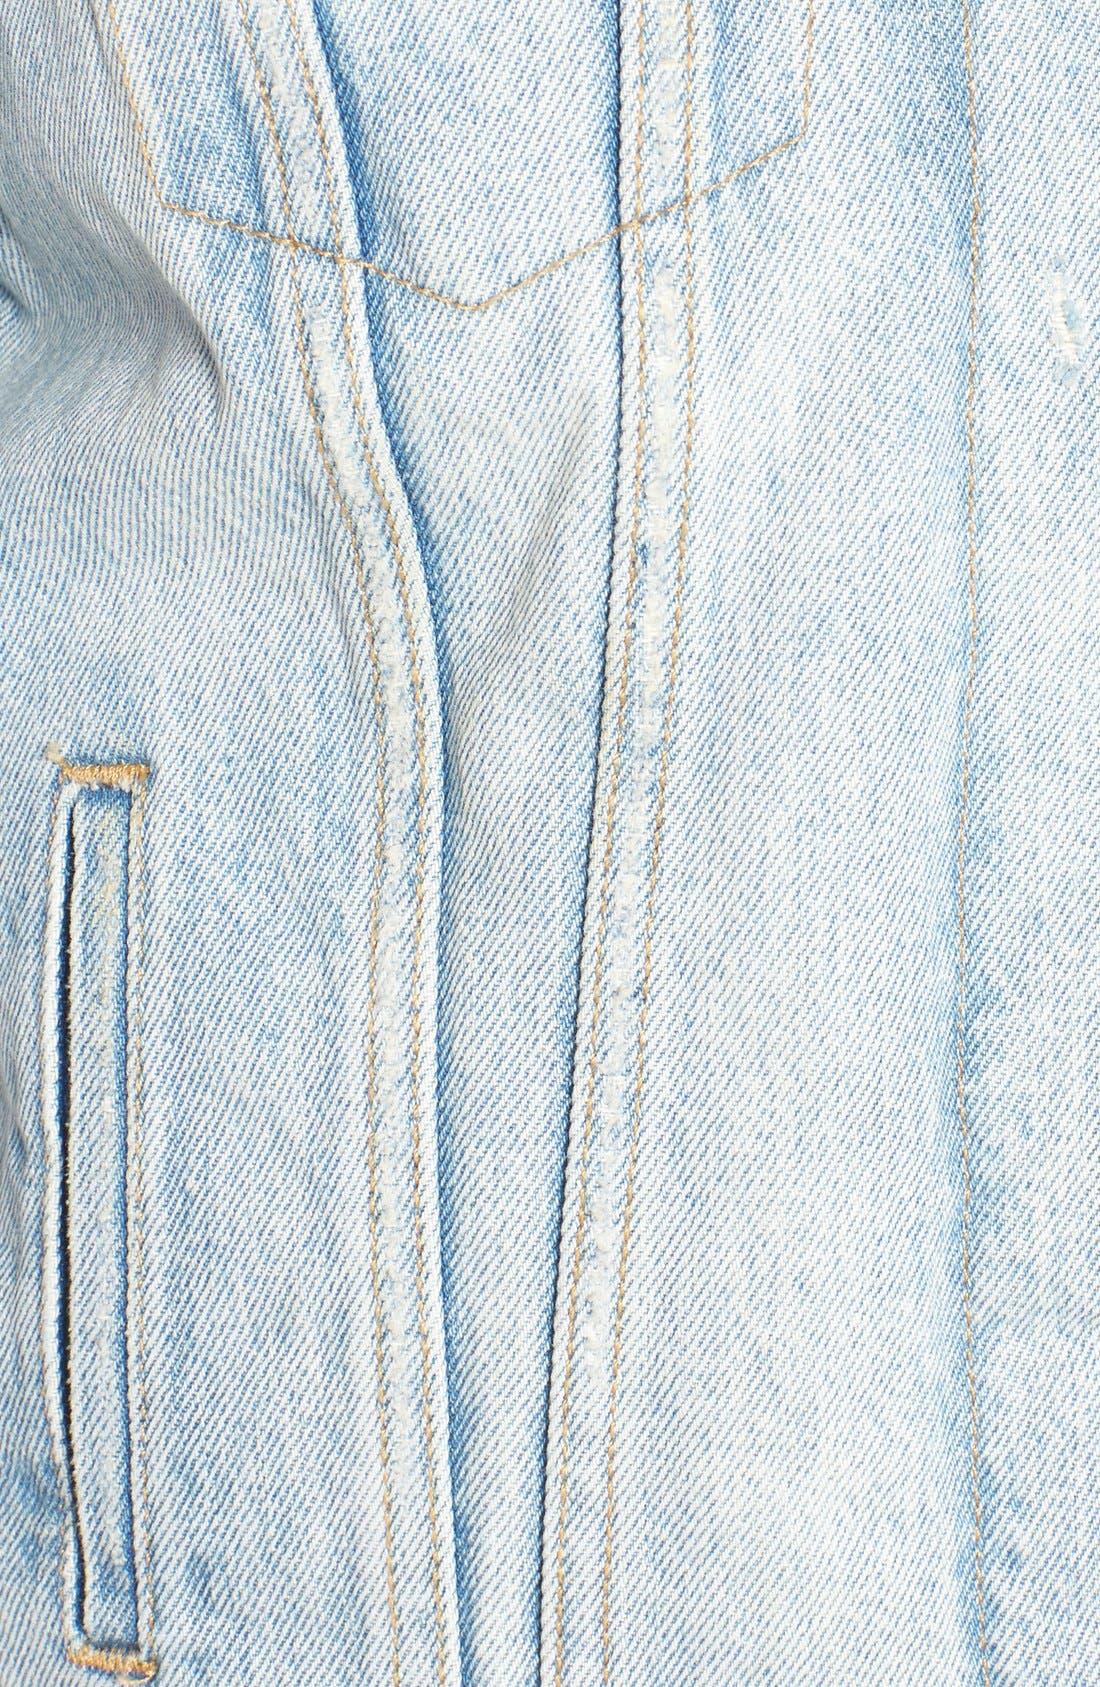 Trucker Jacket with Faux Fur Trim,                             Alternate thumbnail 5, color,                             420